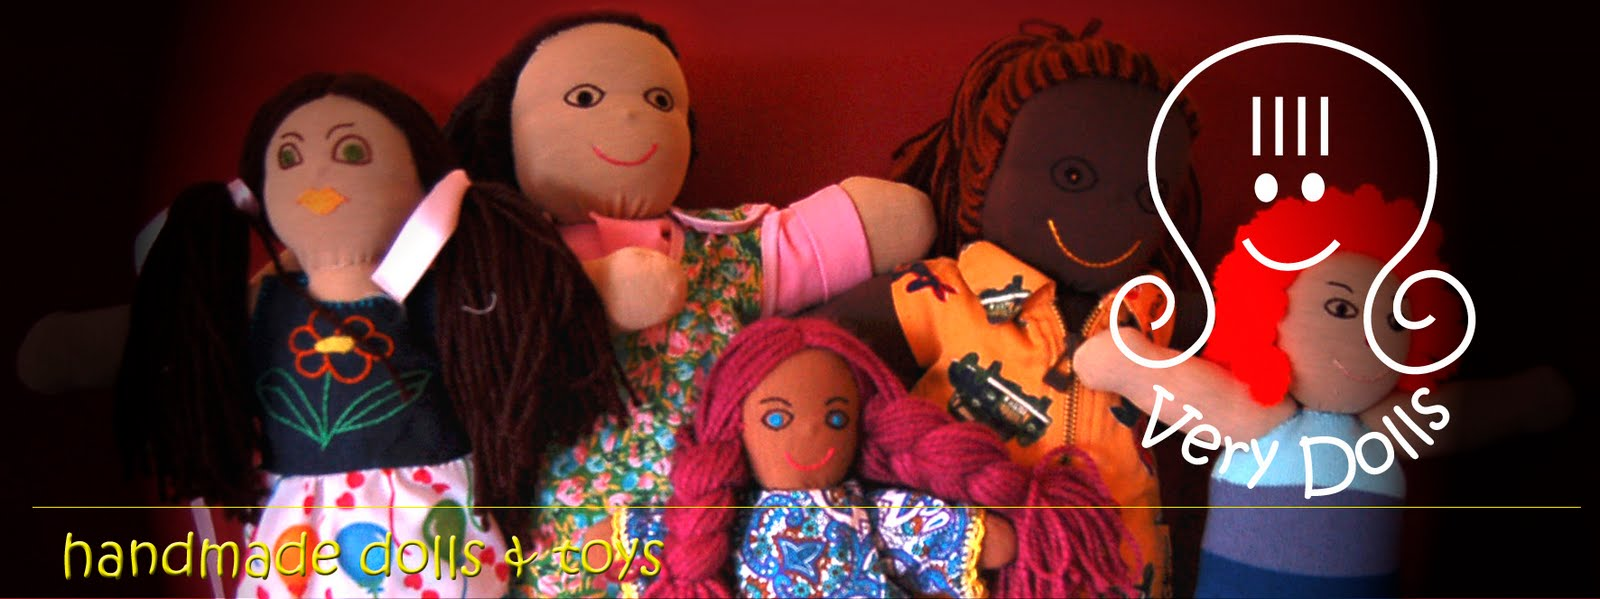 Very Dolls